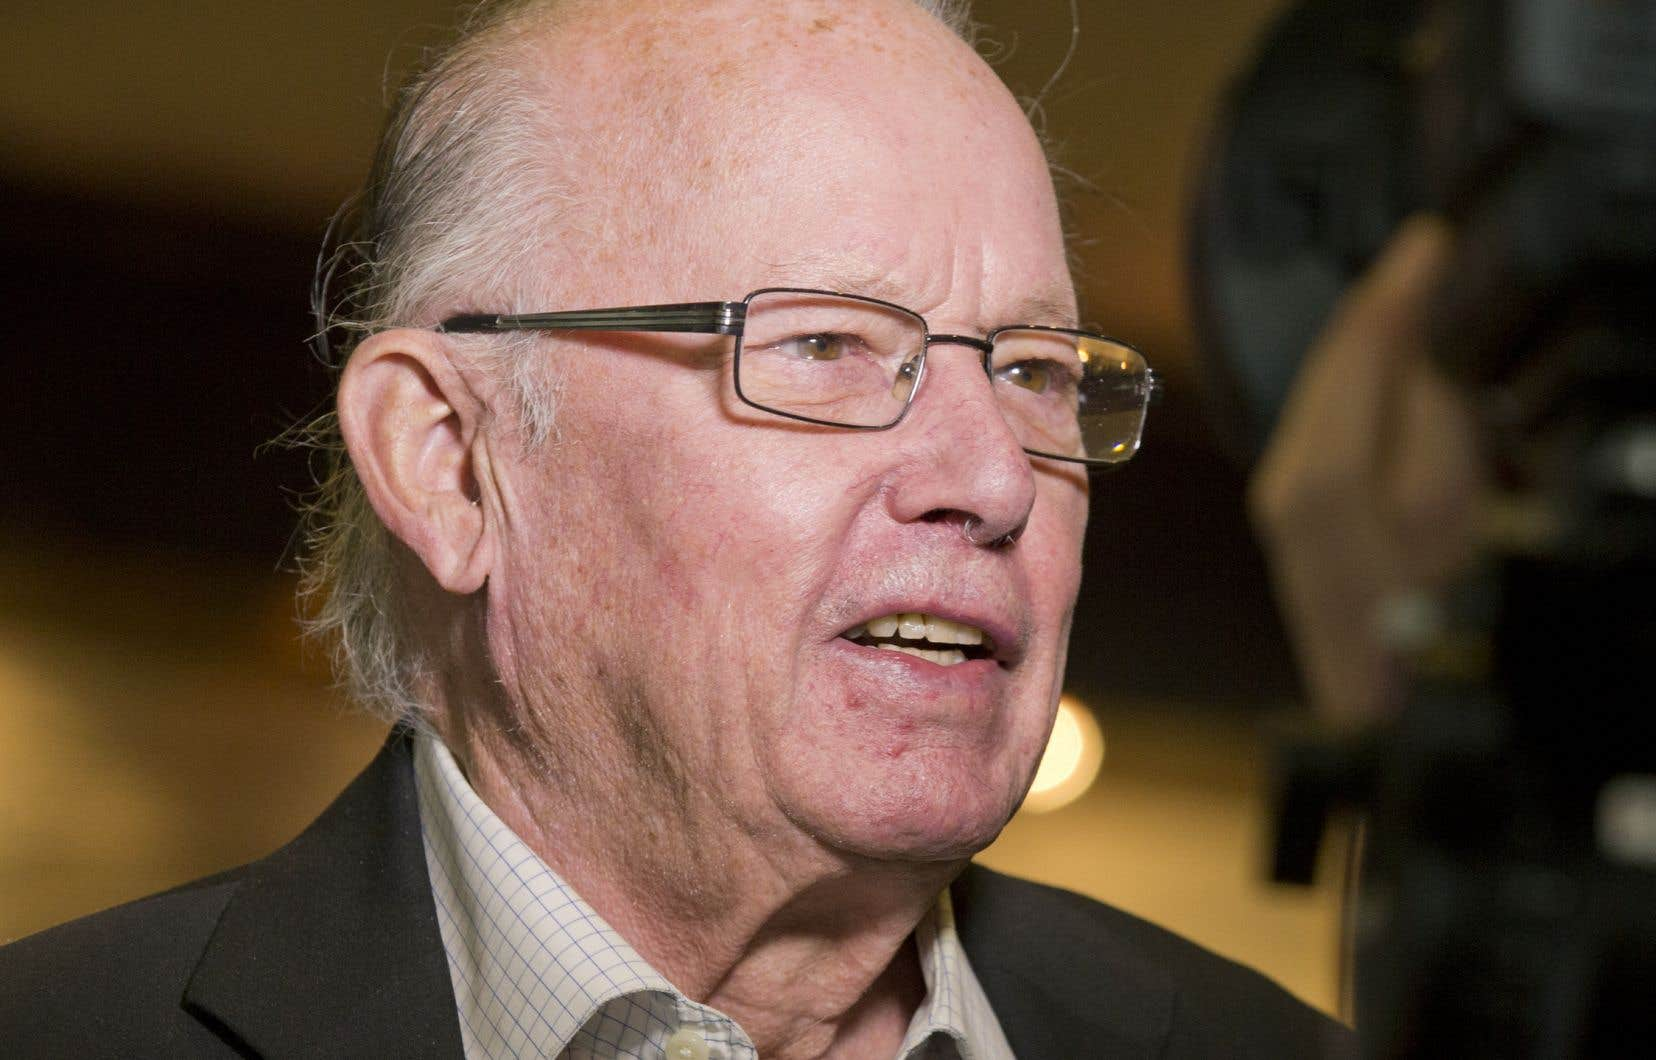 L'ex-premier ministre du Québec Bernard Landry